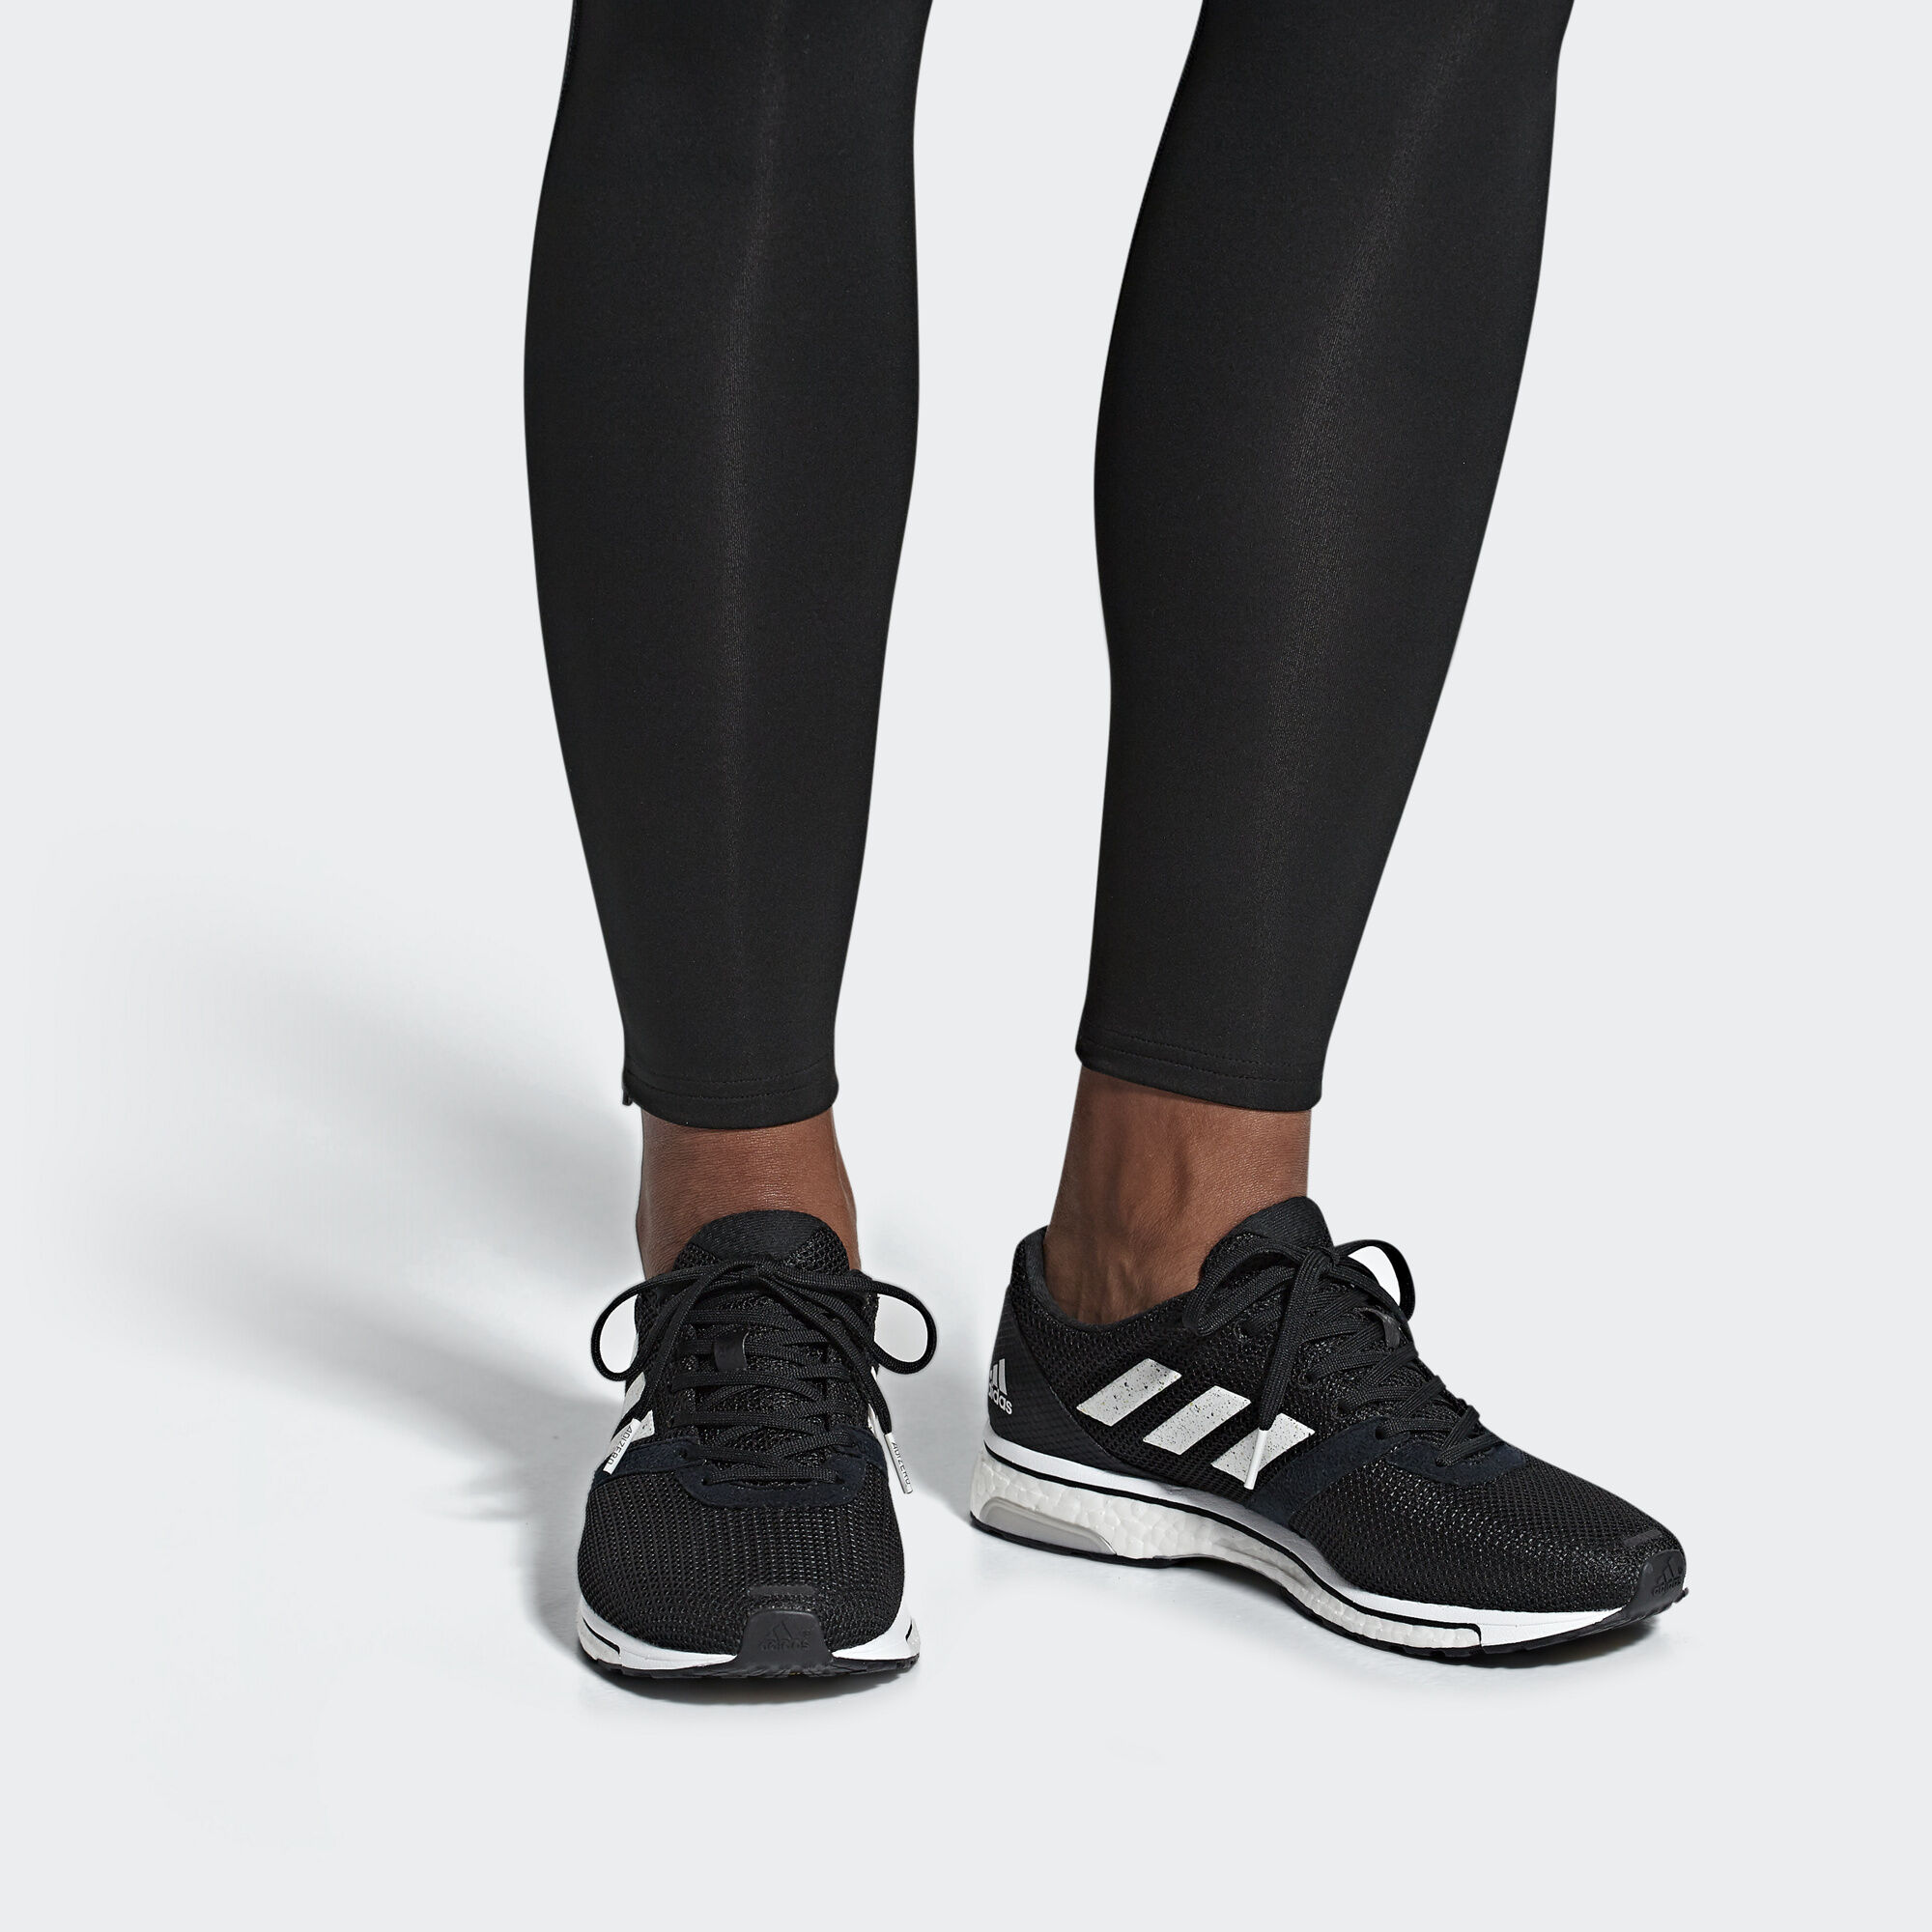 promo code 6bbf1 1fd59 adidas adizero adios 4 m - Blue  adidas New Zealand